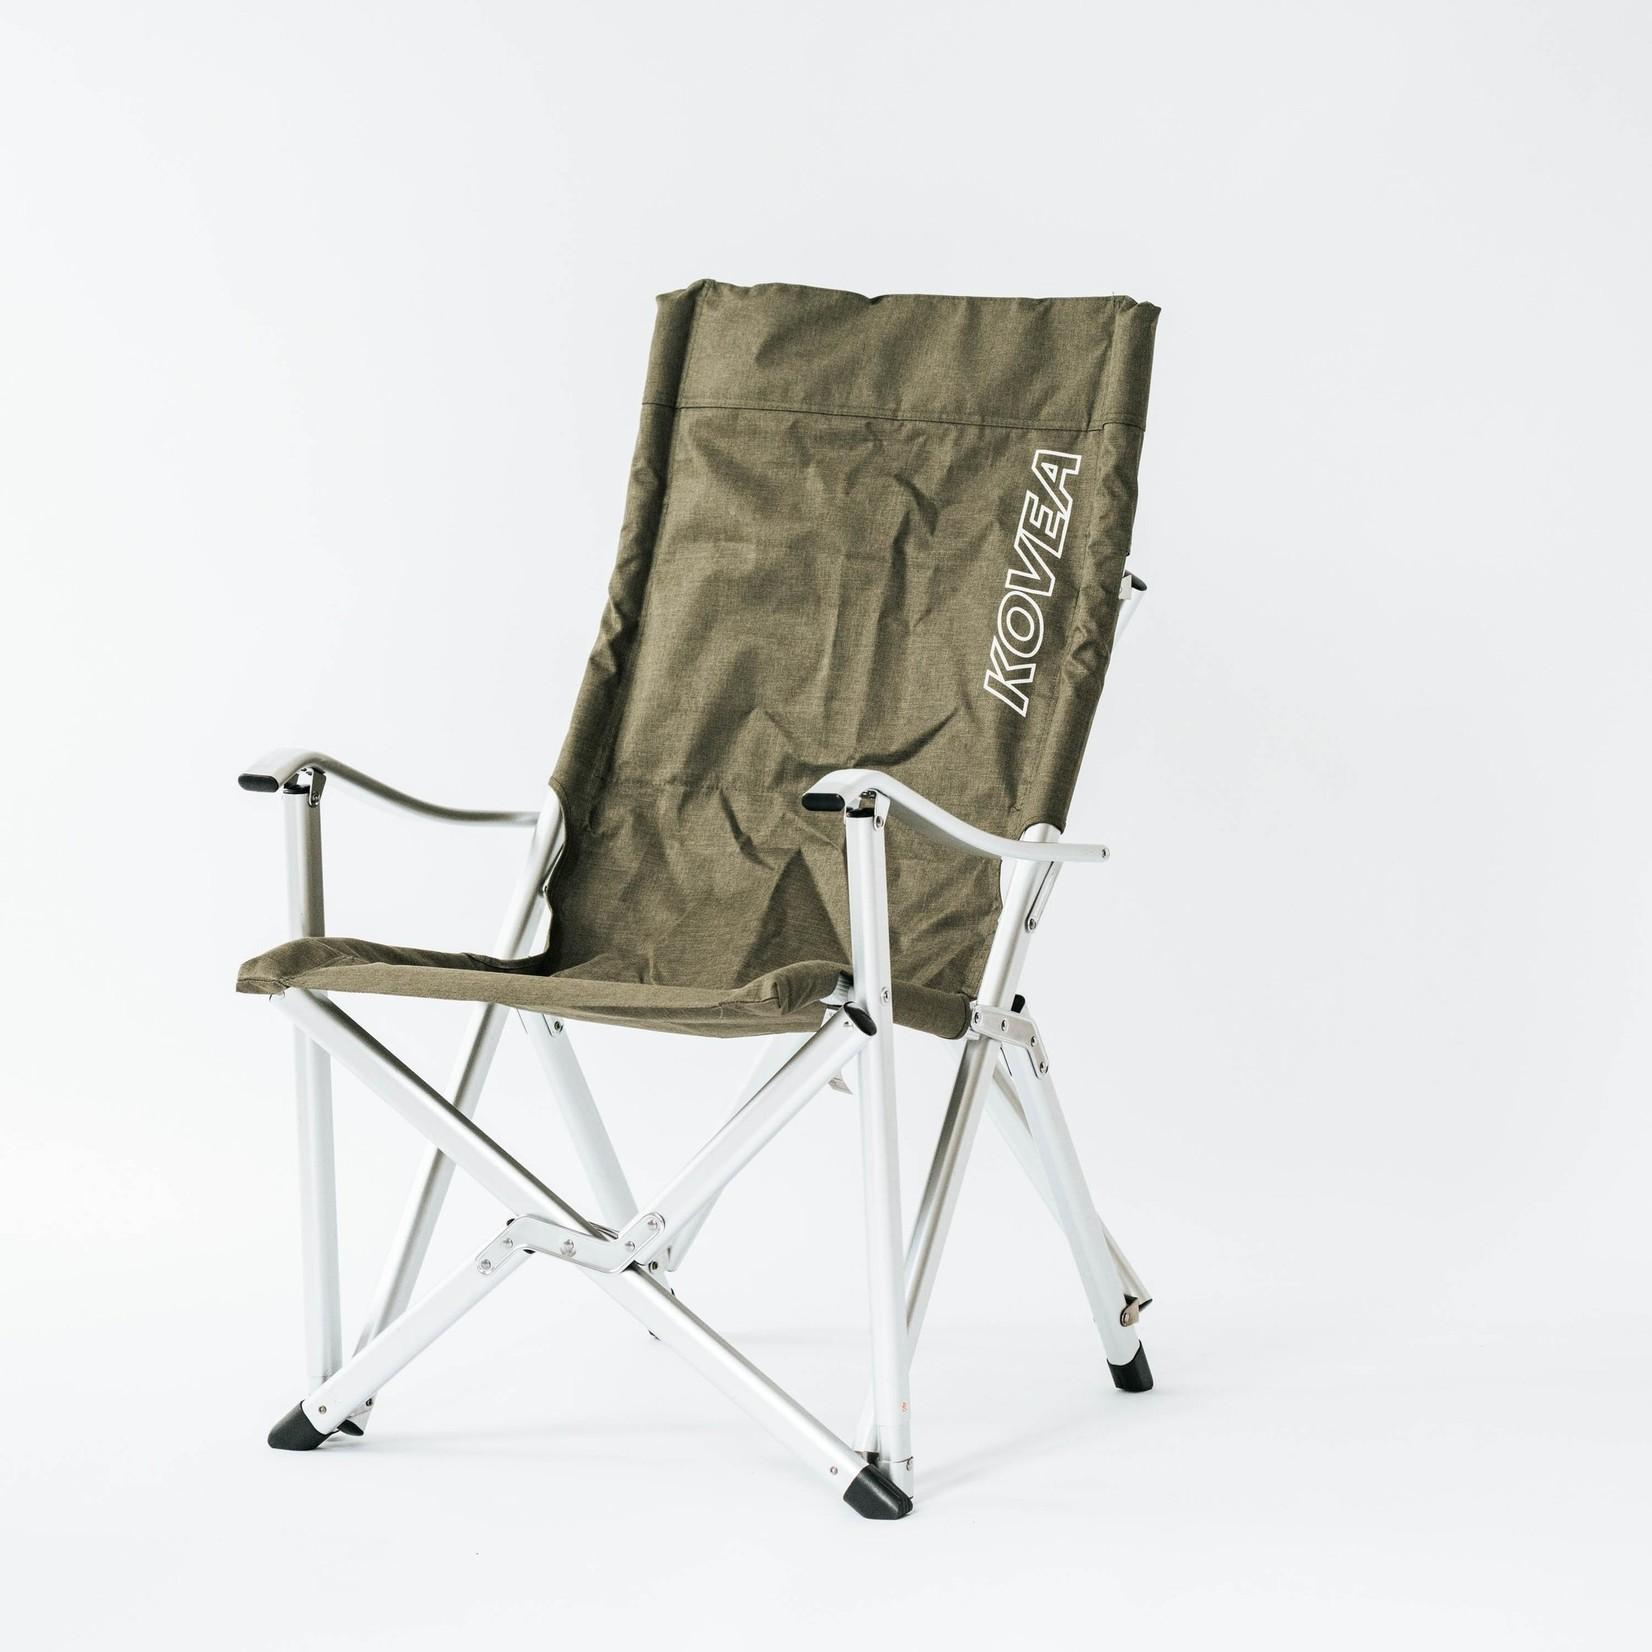 Kovea Kovea Field Luxury Chair II